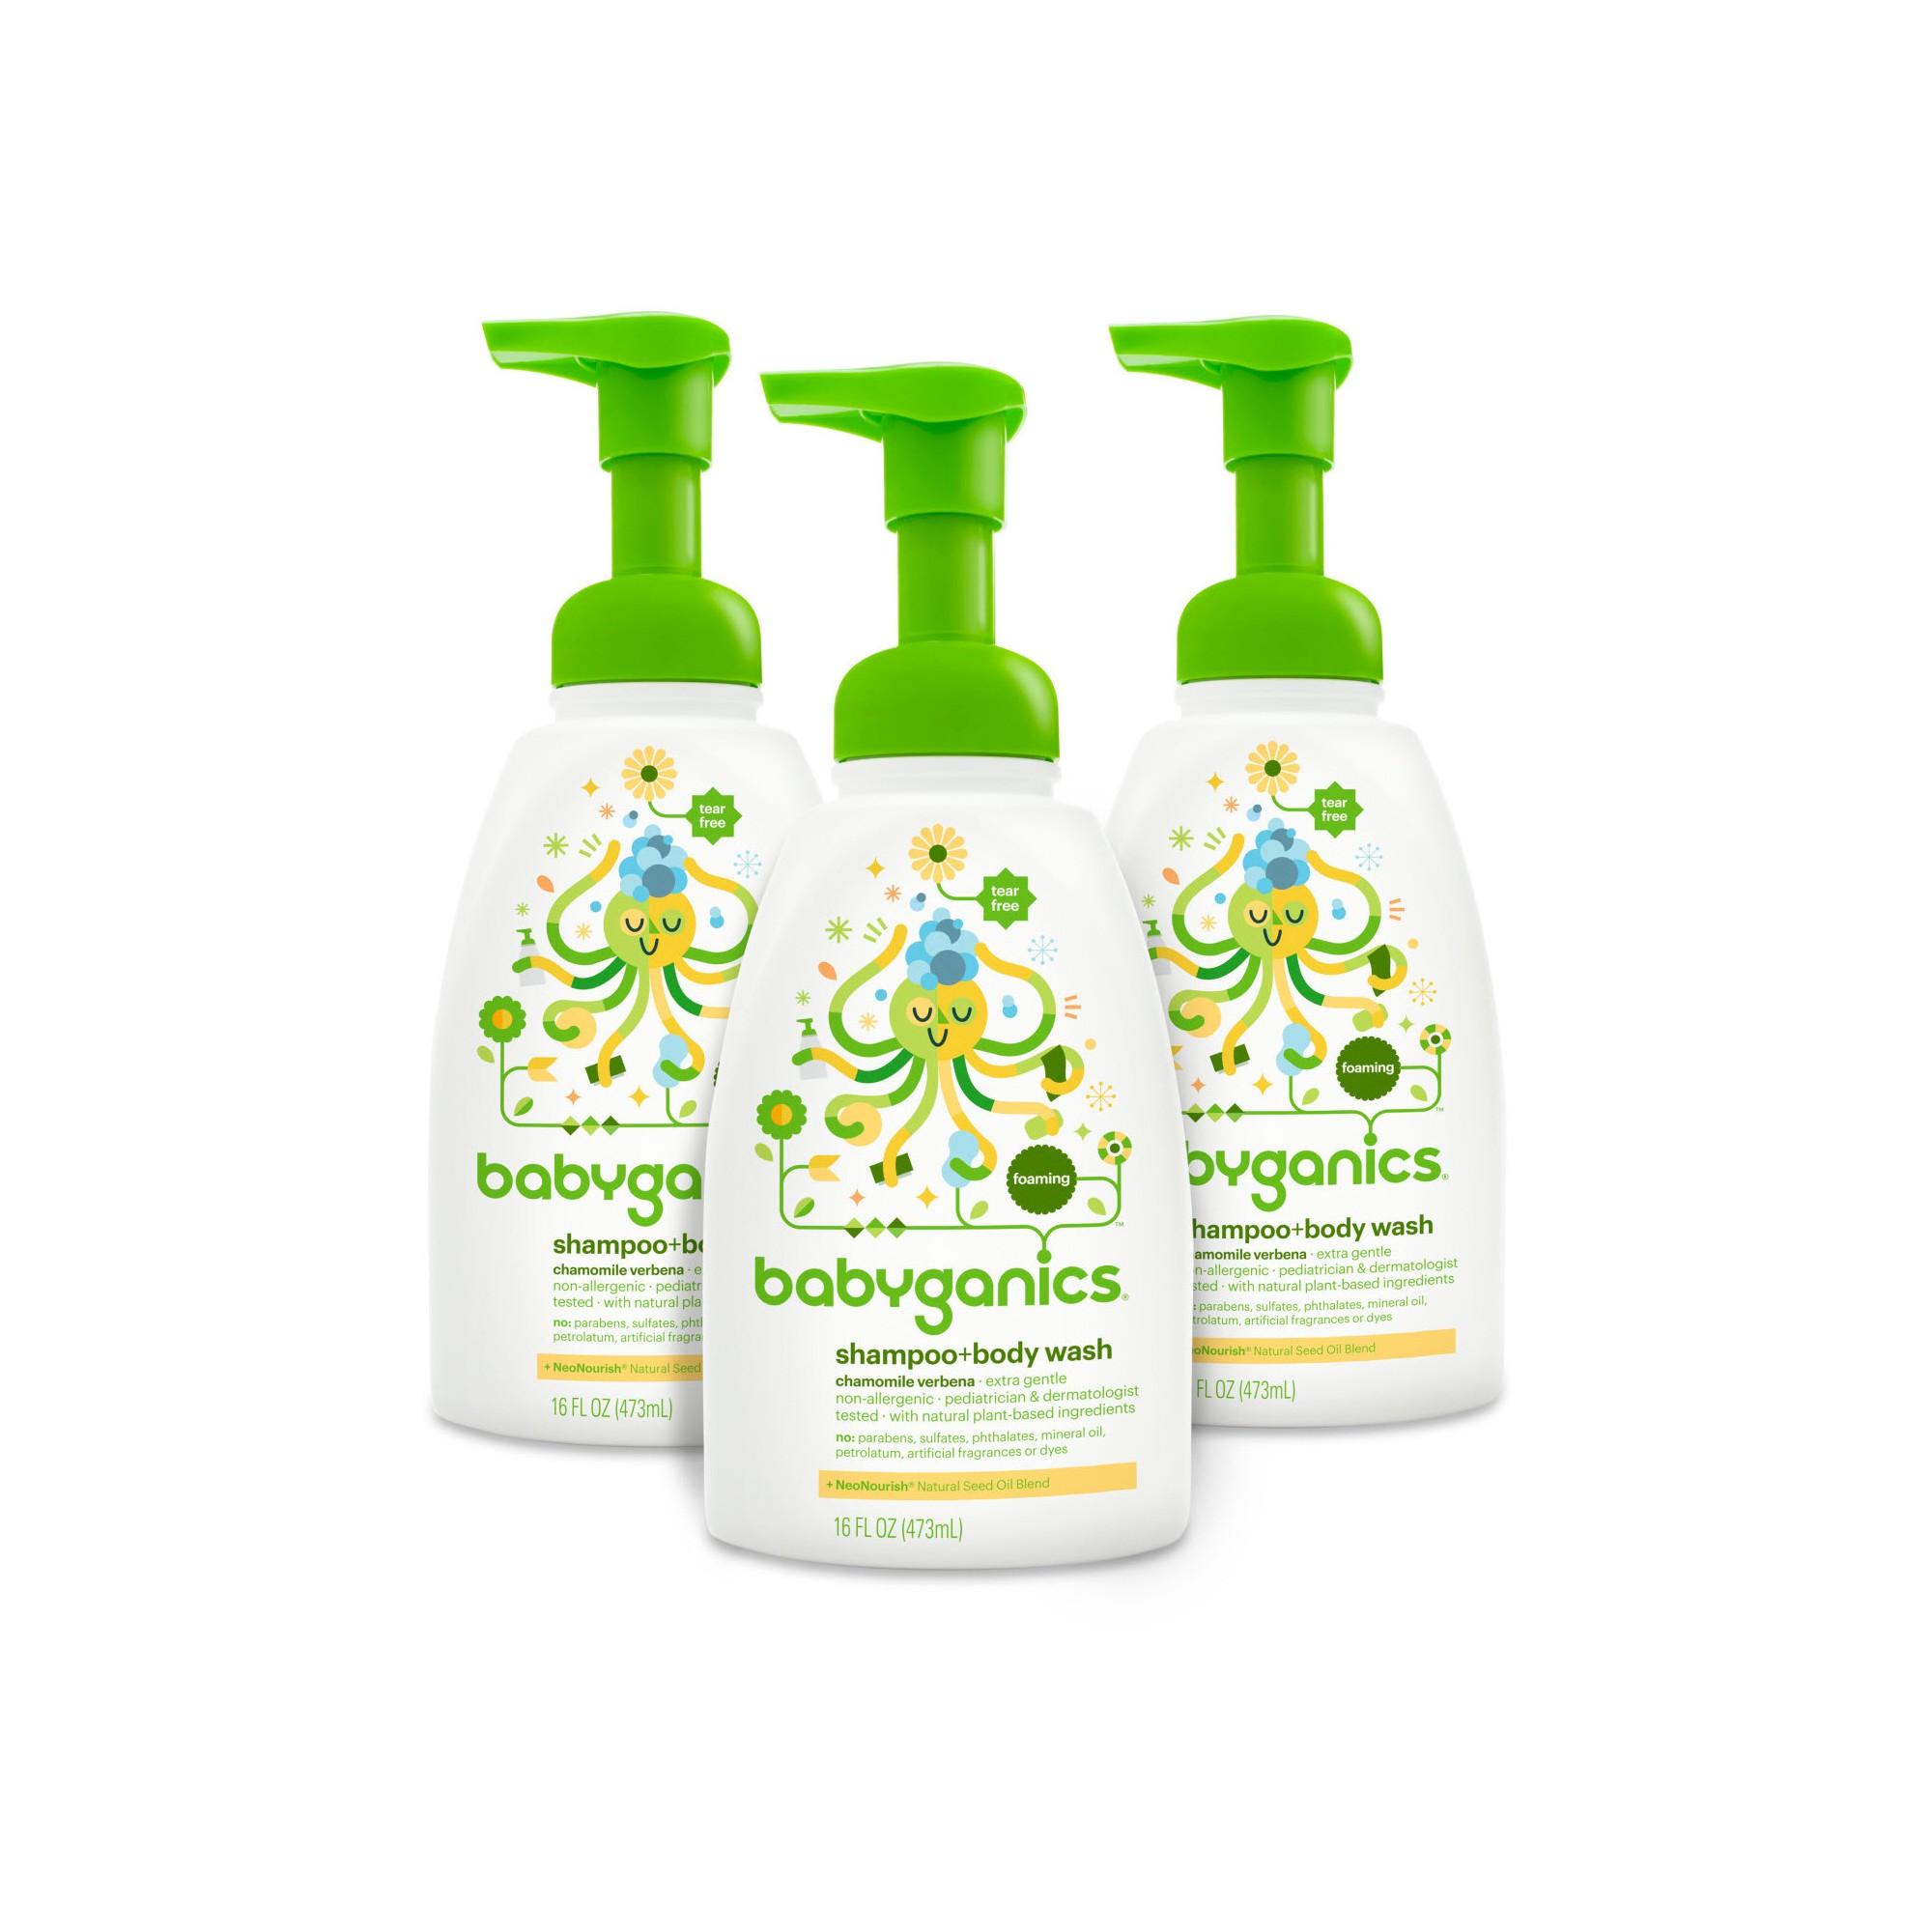 Babyganics Shampoo Body Wash Chamomile Verbena 16oz 3pk